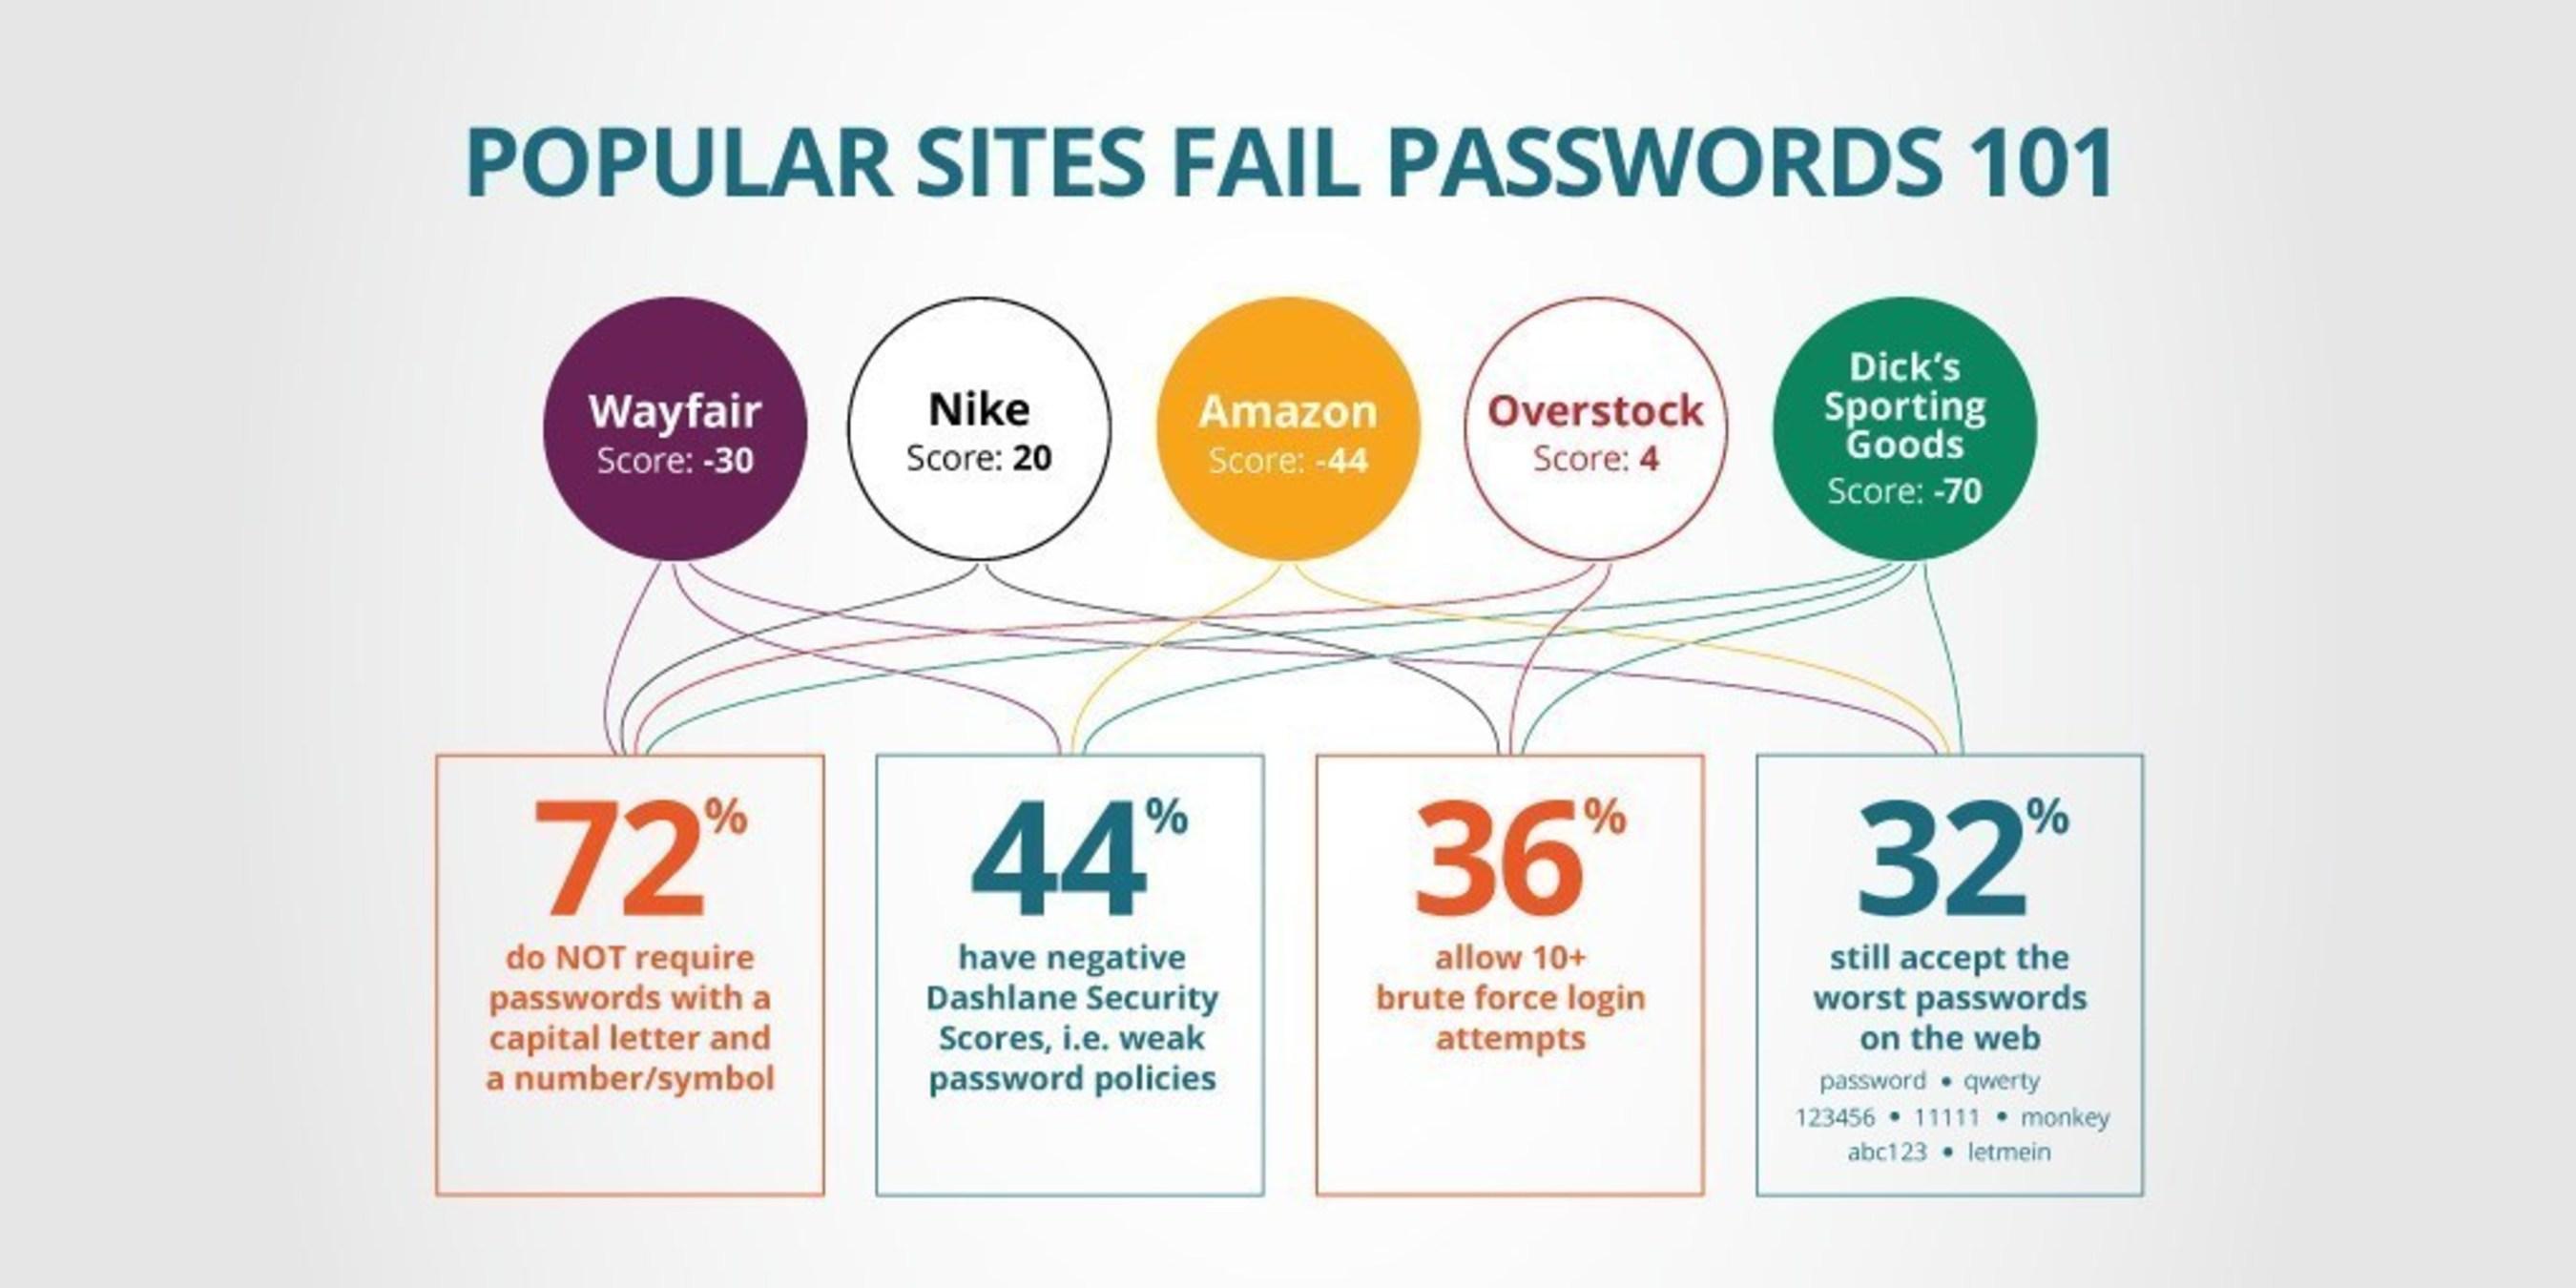 Dashlane ECommerce Roundup - Popular Sites Fail Passwords 101